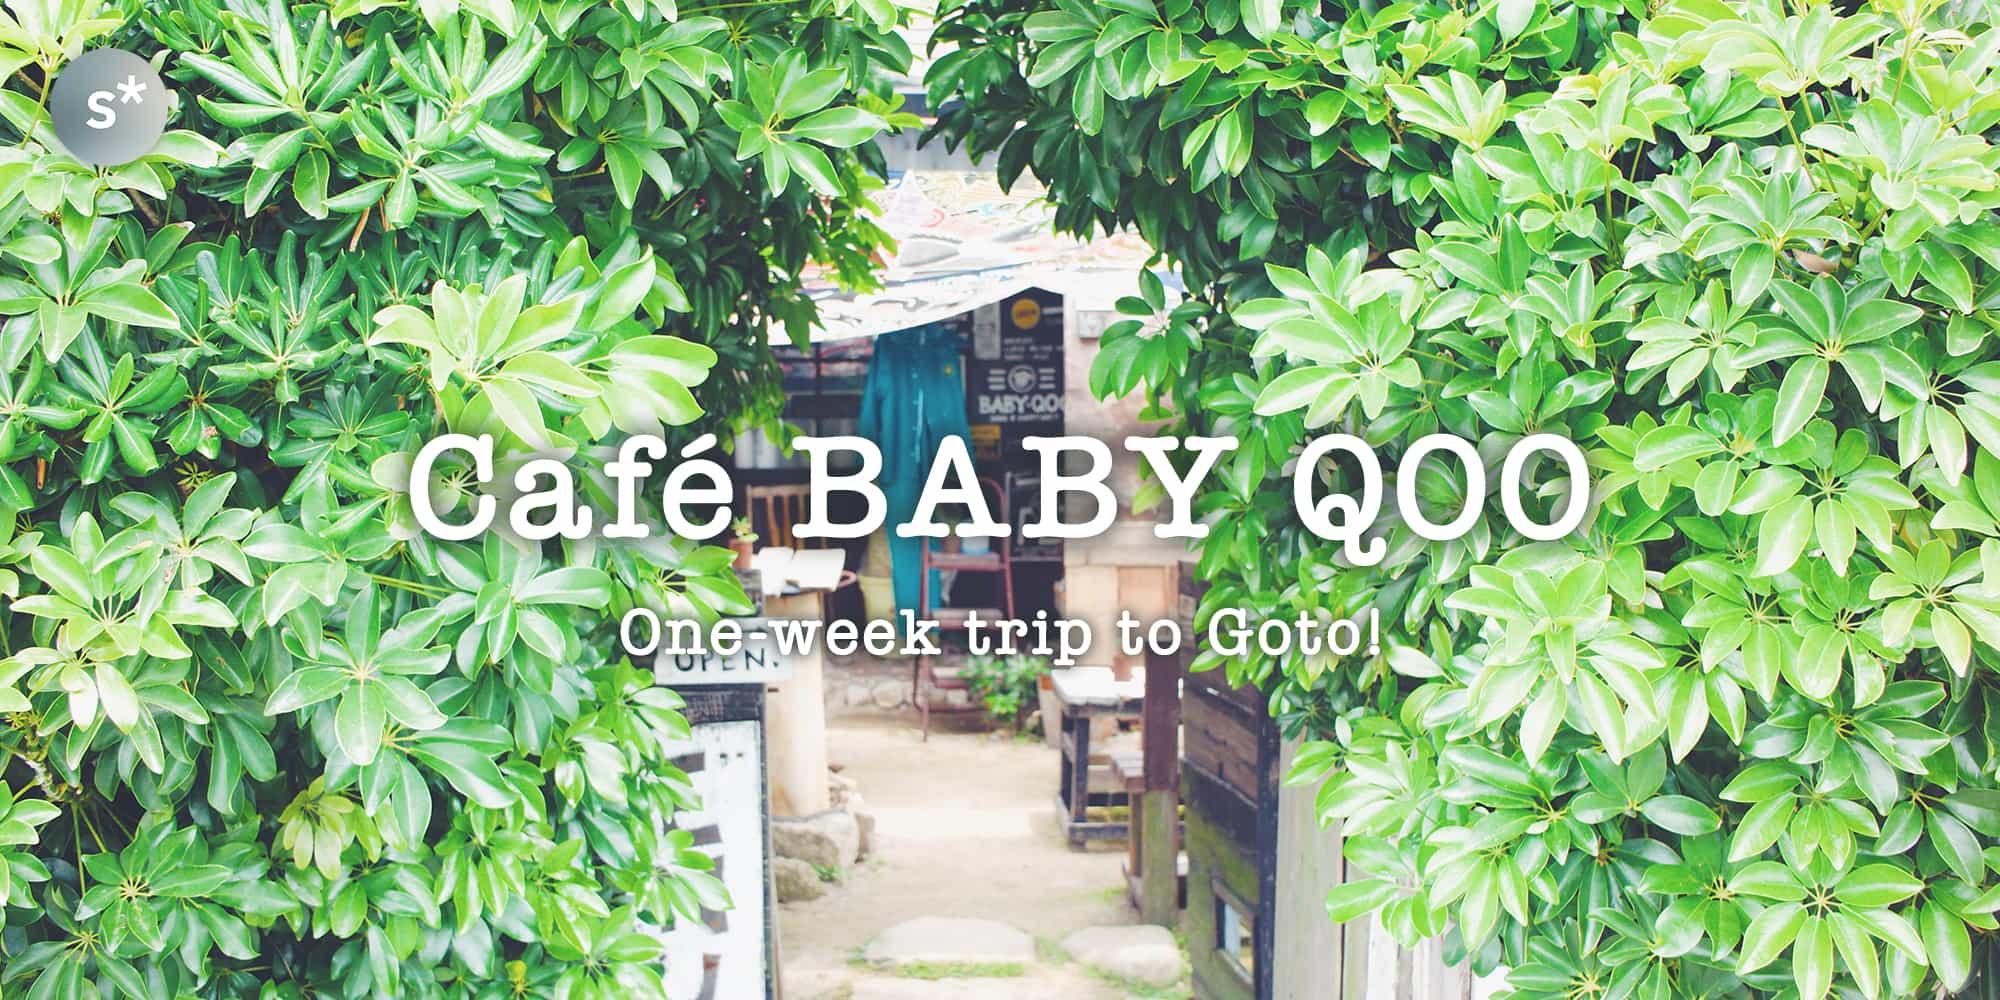 baby-qoo